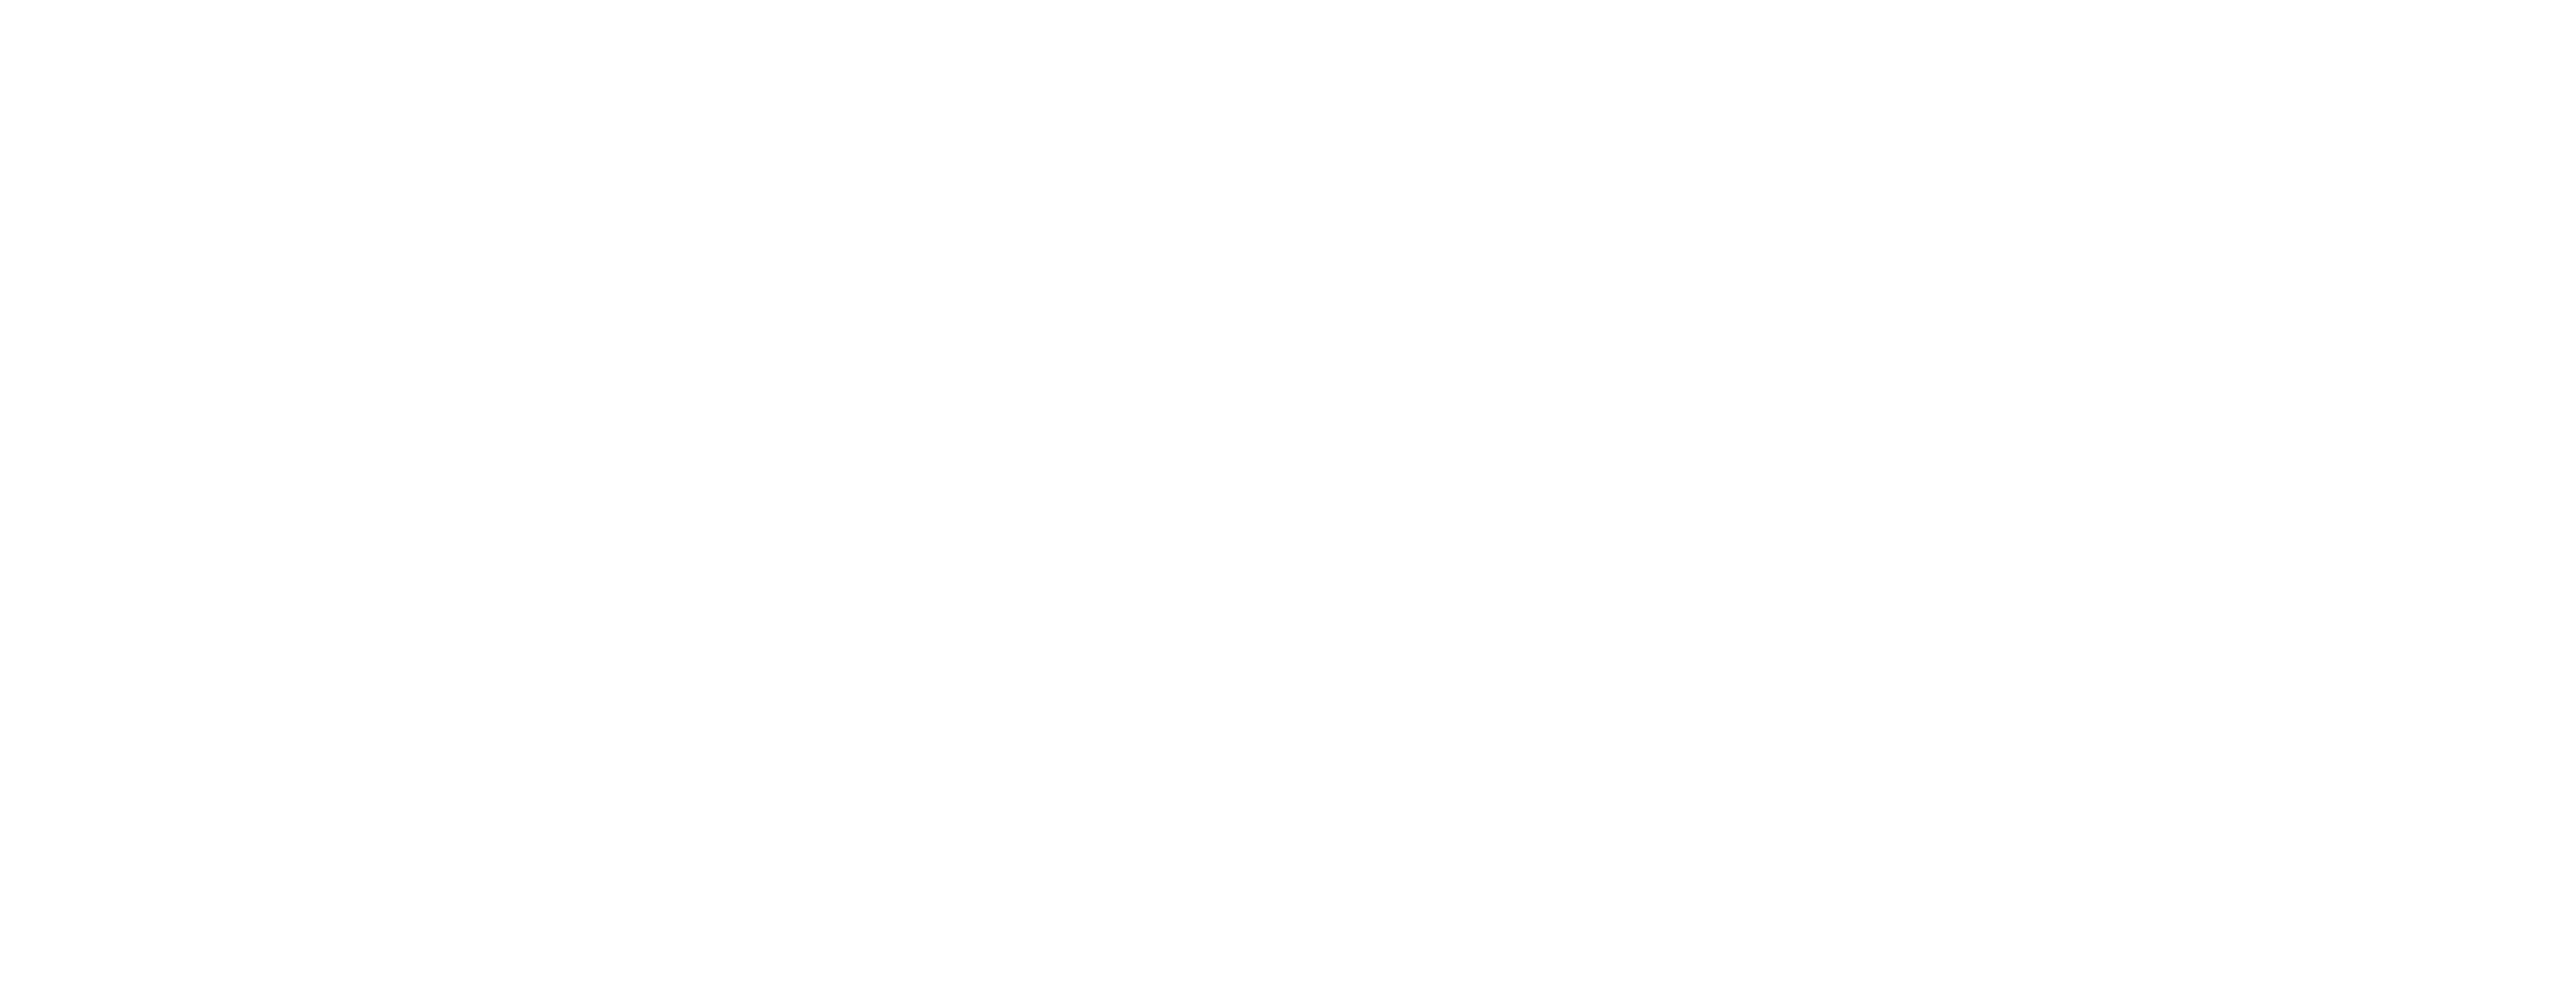 SADC Matagami